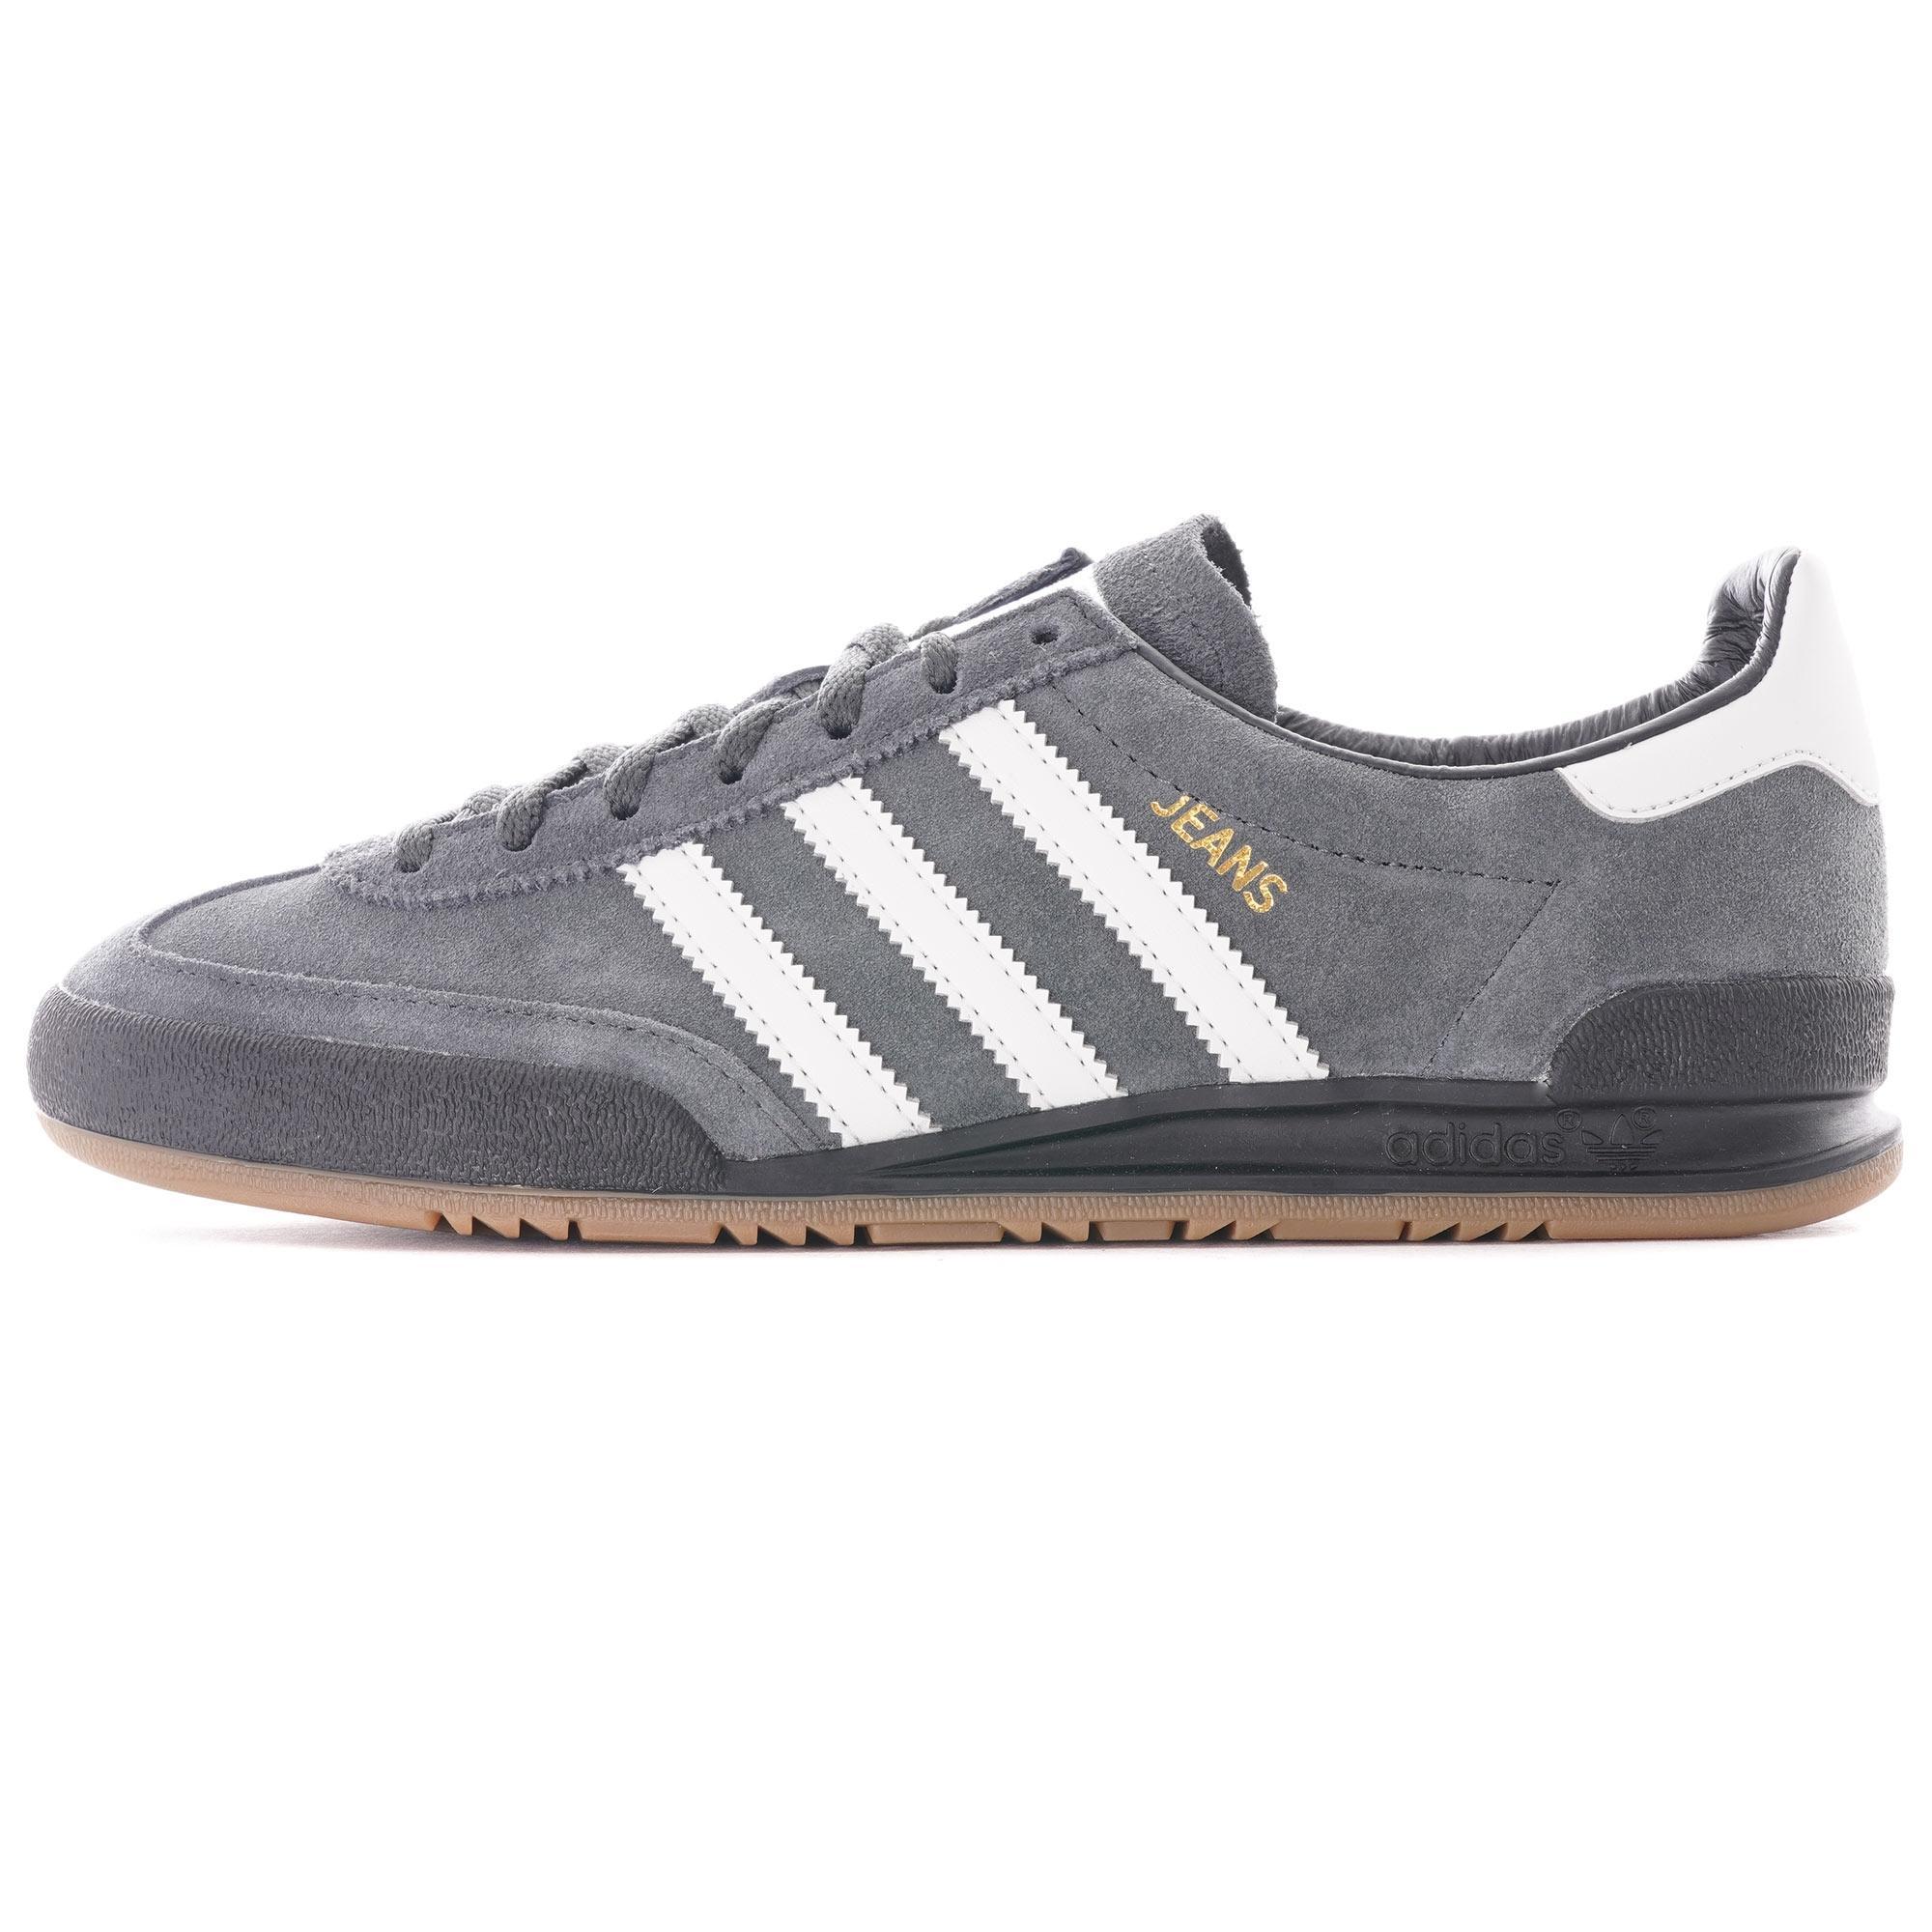 adidas Originals Denim Jeans Trainers in Grey (Grey) for Men - Lyst